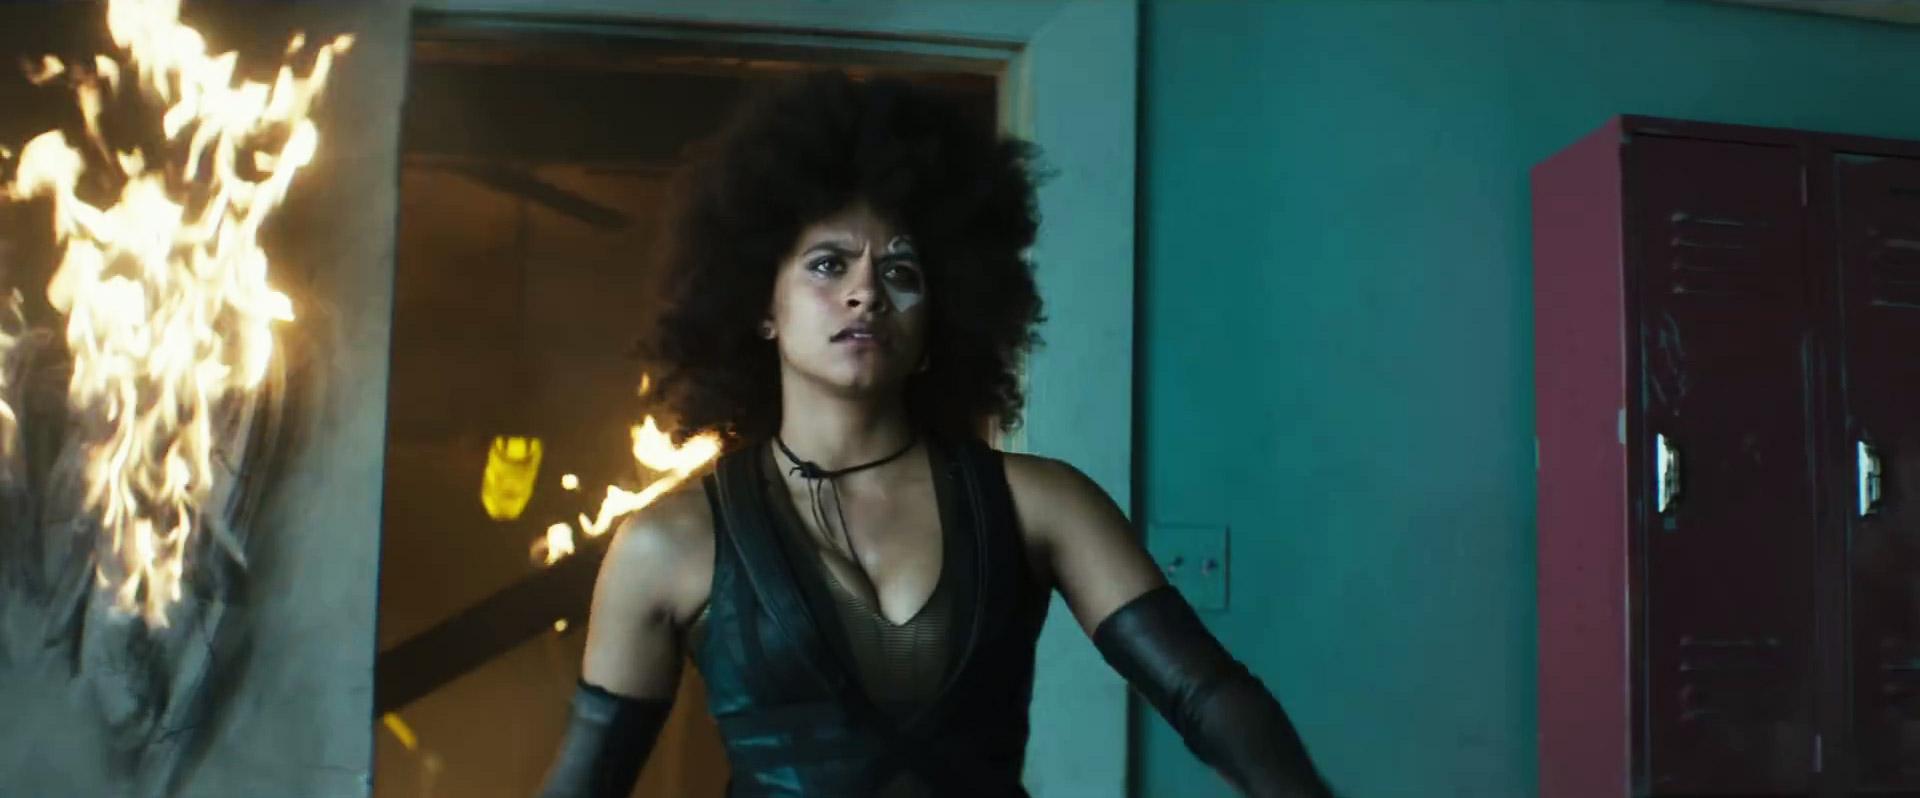 Super Cool Trailer for Deadpool 2